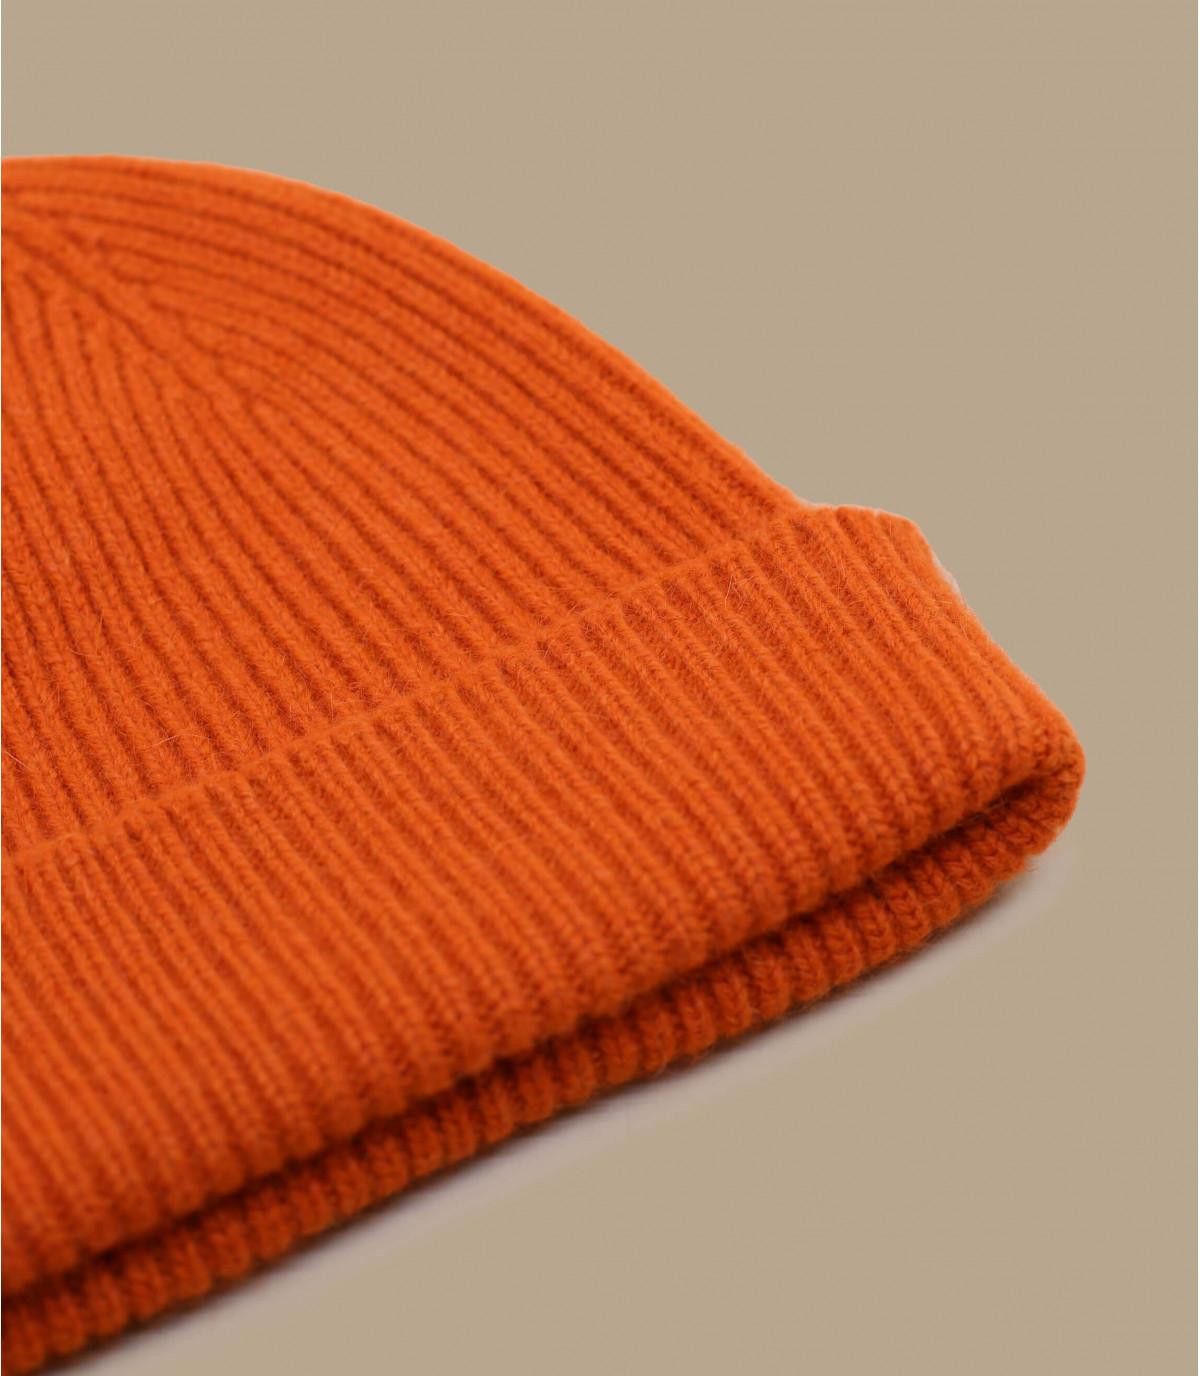 bonnet revers orange laine angora